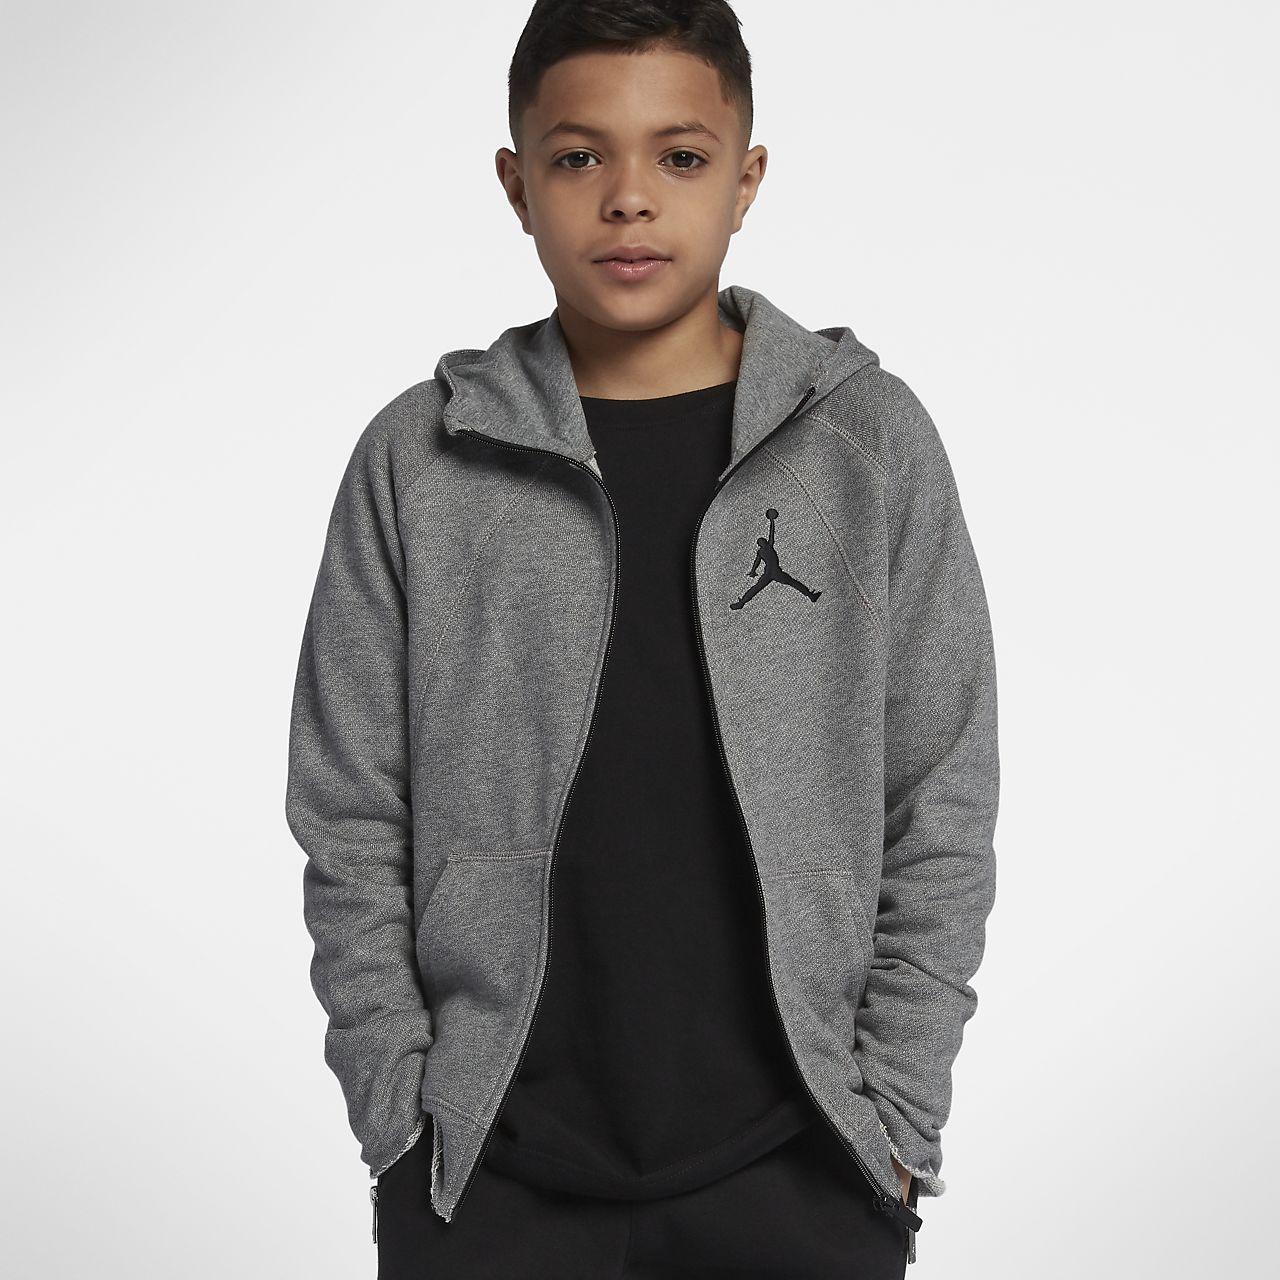 9a9ed80d393 ... Jordan Sportswear Wings Lite Older Kids' (Boys') Full-Zip Hoodie